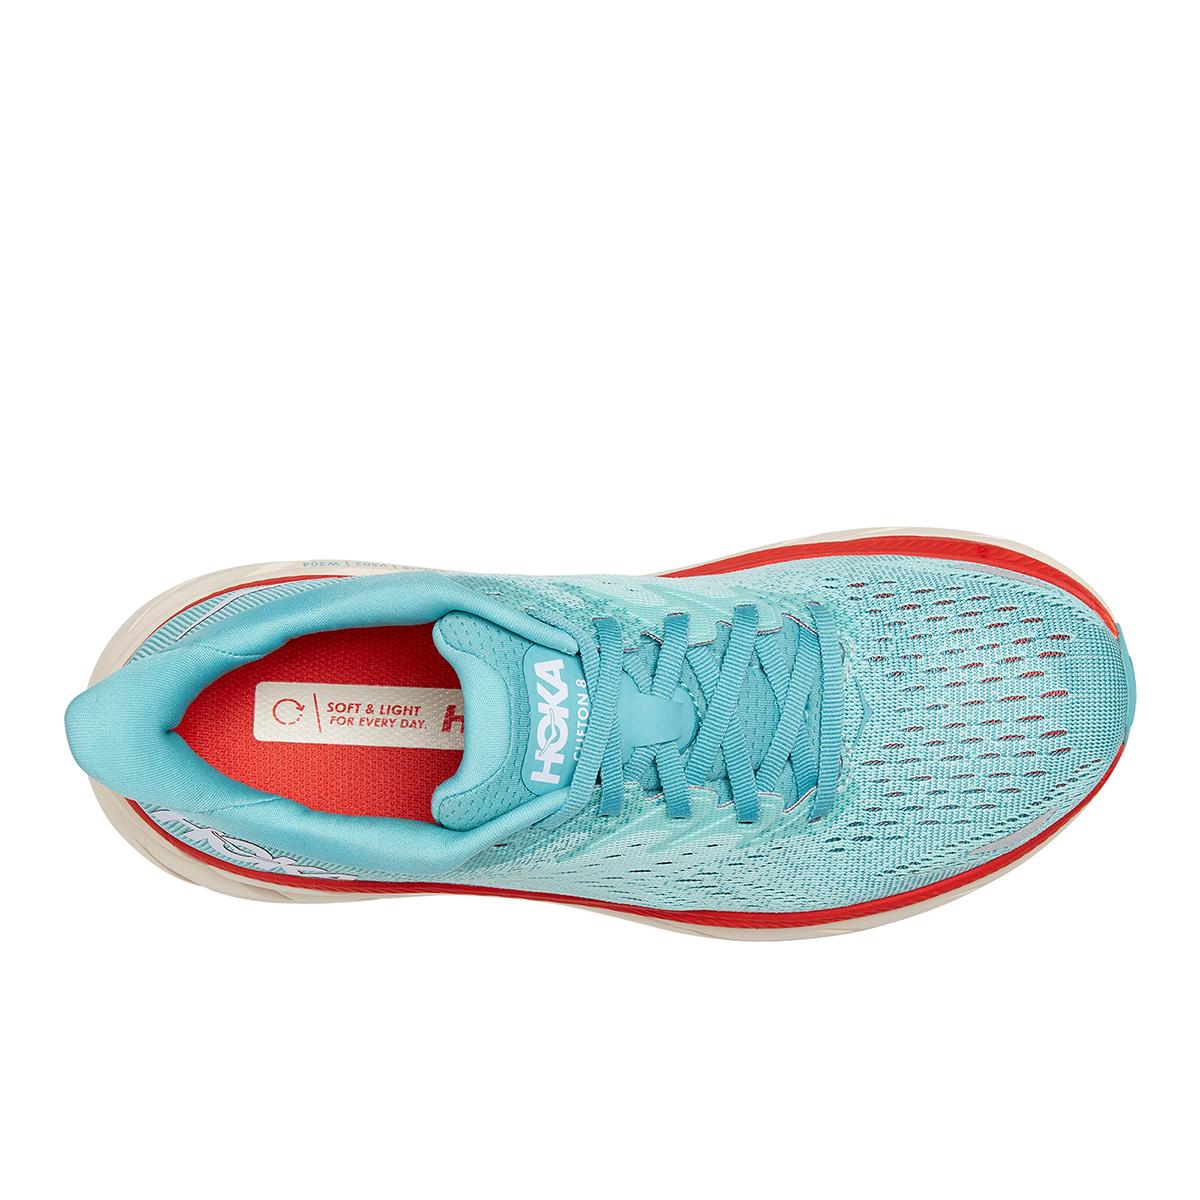 Women's Hoka One One Clifton 8 Running Shoe - Color: Aquarelle / Eggshell Blue - Size: 5 - Width: Regular, Aquarelle / Eggshell Blue, large, image 3